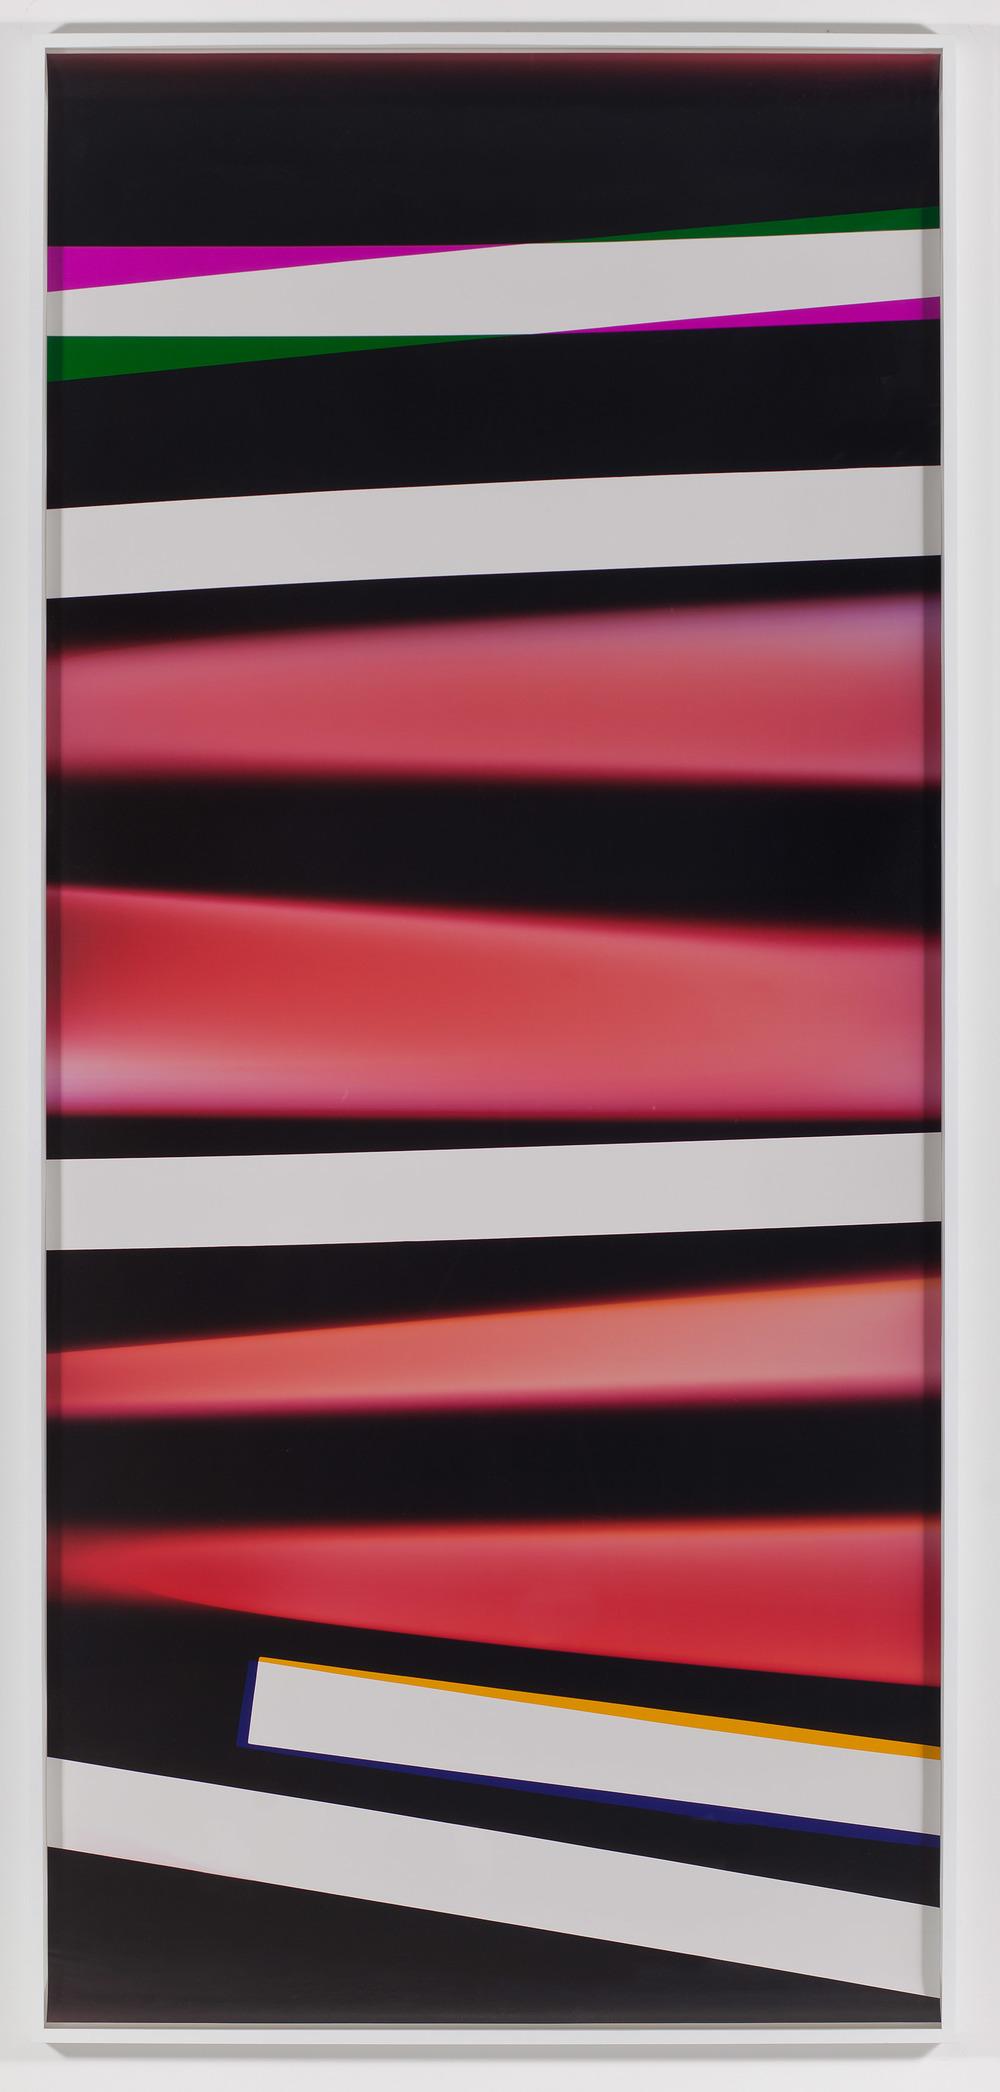 Black Curl (CMY/Five Magnet: Irvine, California, March 26,2010, Fujicolor Crystal Archive Super Type C, Em. No. 165-021, 07210)    2011   Color photographic paper  112 1/2 x 50 inches   PROCESSCOLORFIELD, 2011